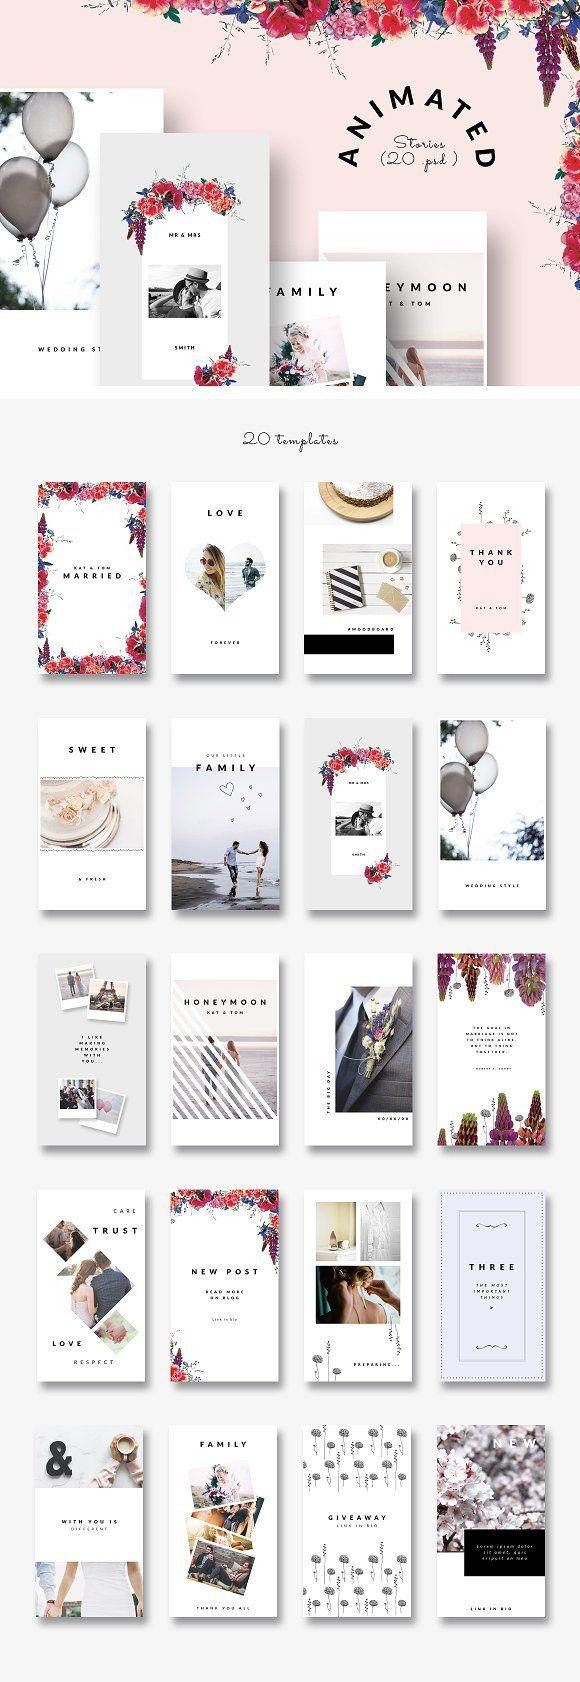 Animated Instagram Stories Wedding Instagram Design Card Design Instagram Template